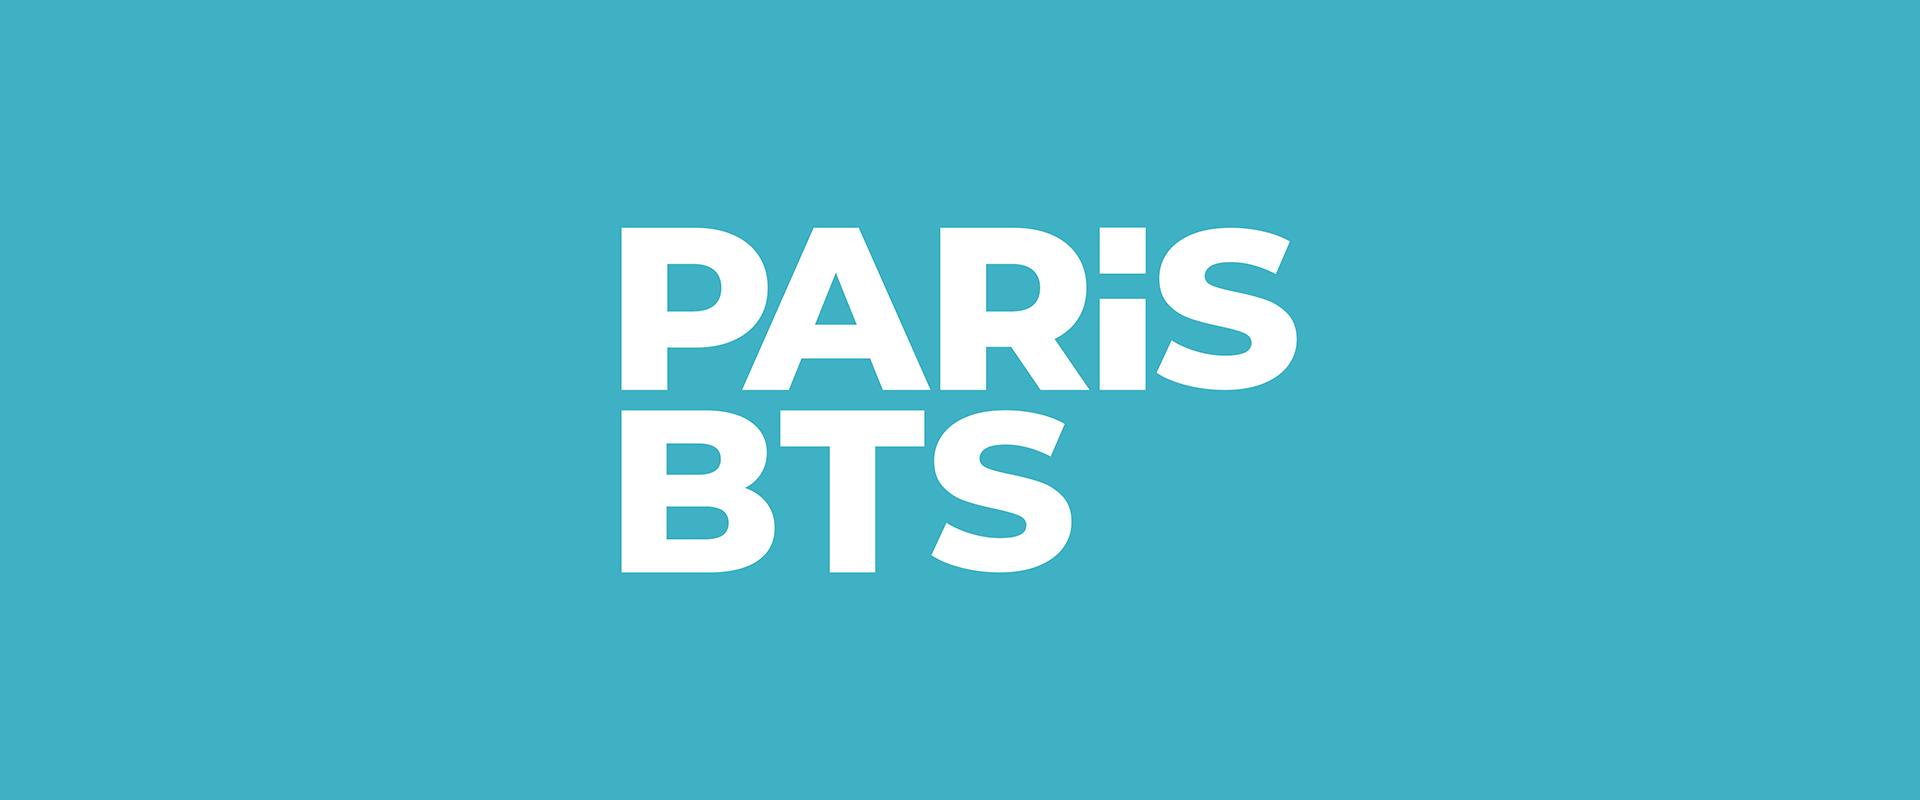 PARIS BTS